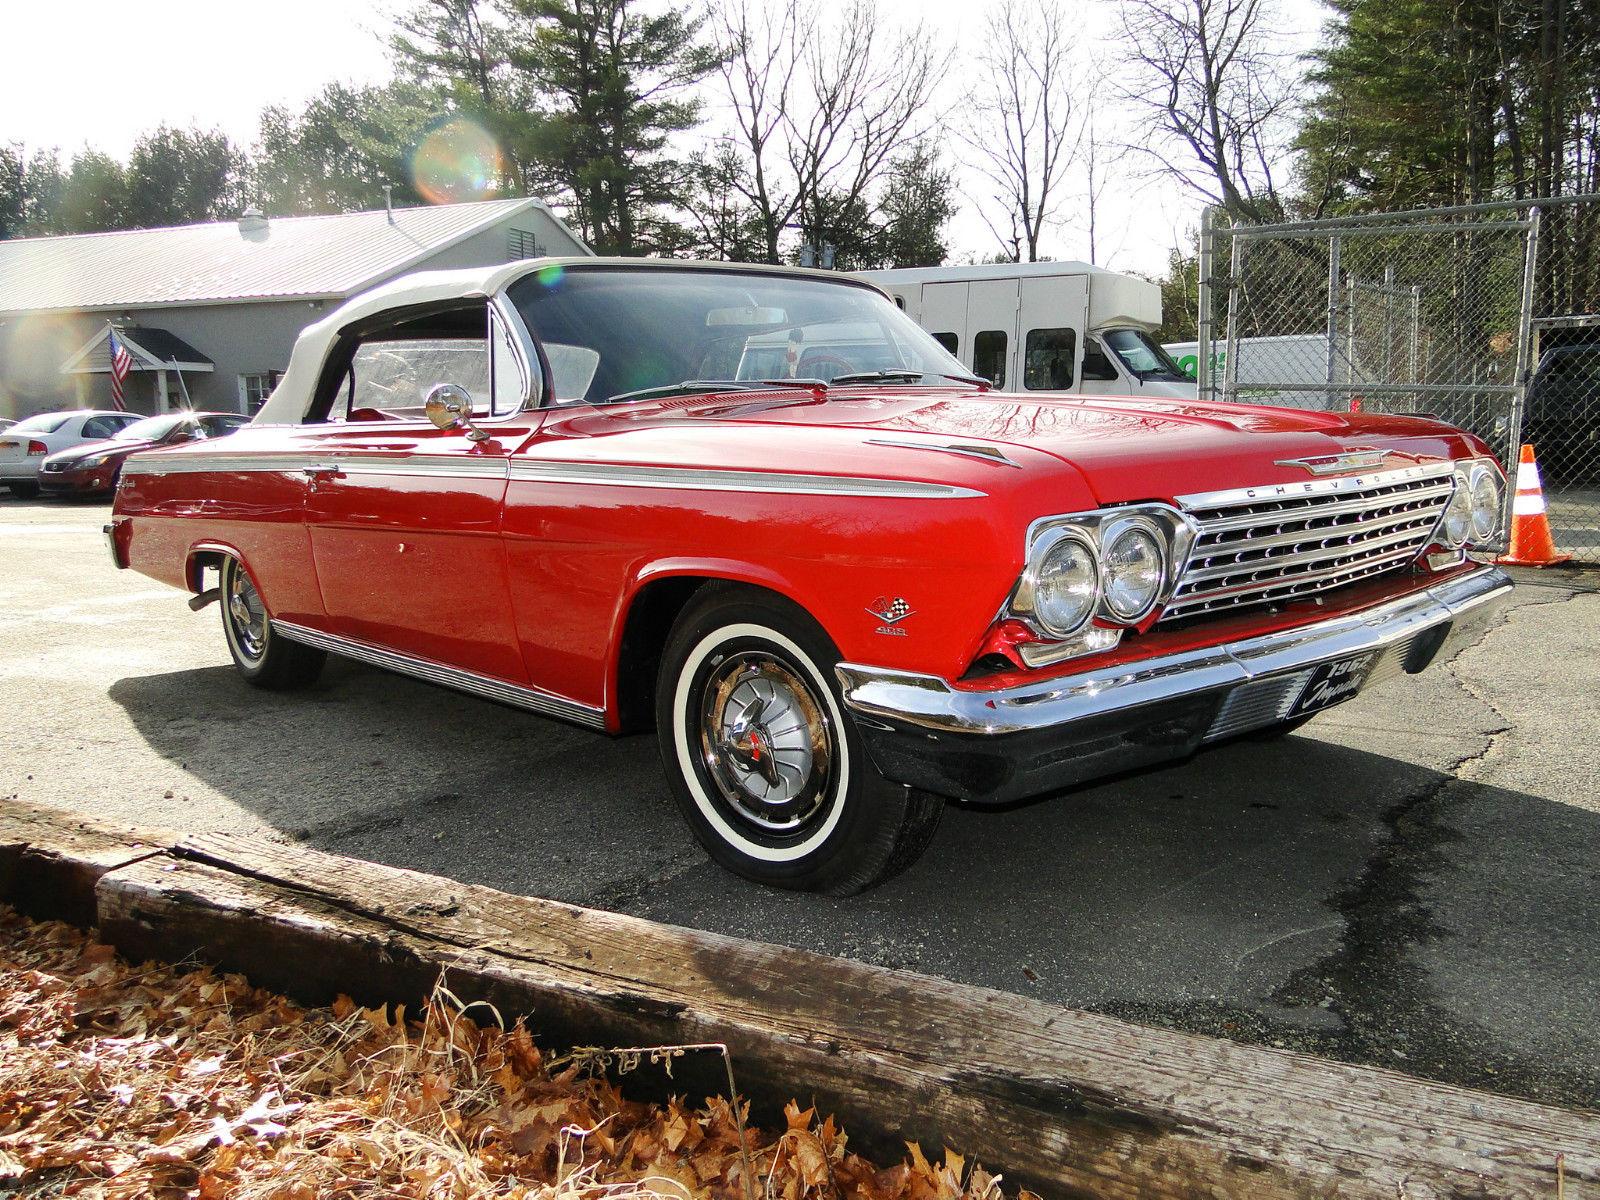 1962 chevrolet impala ss 2 door convertible classic chevrolet impala 1962 for sale. Black Bedroom Furniture Sets. Home Design Ideas